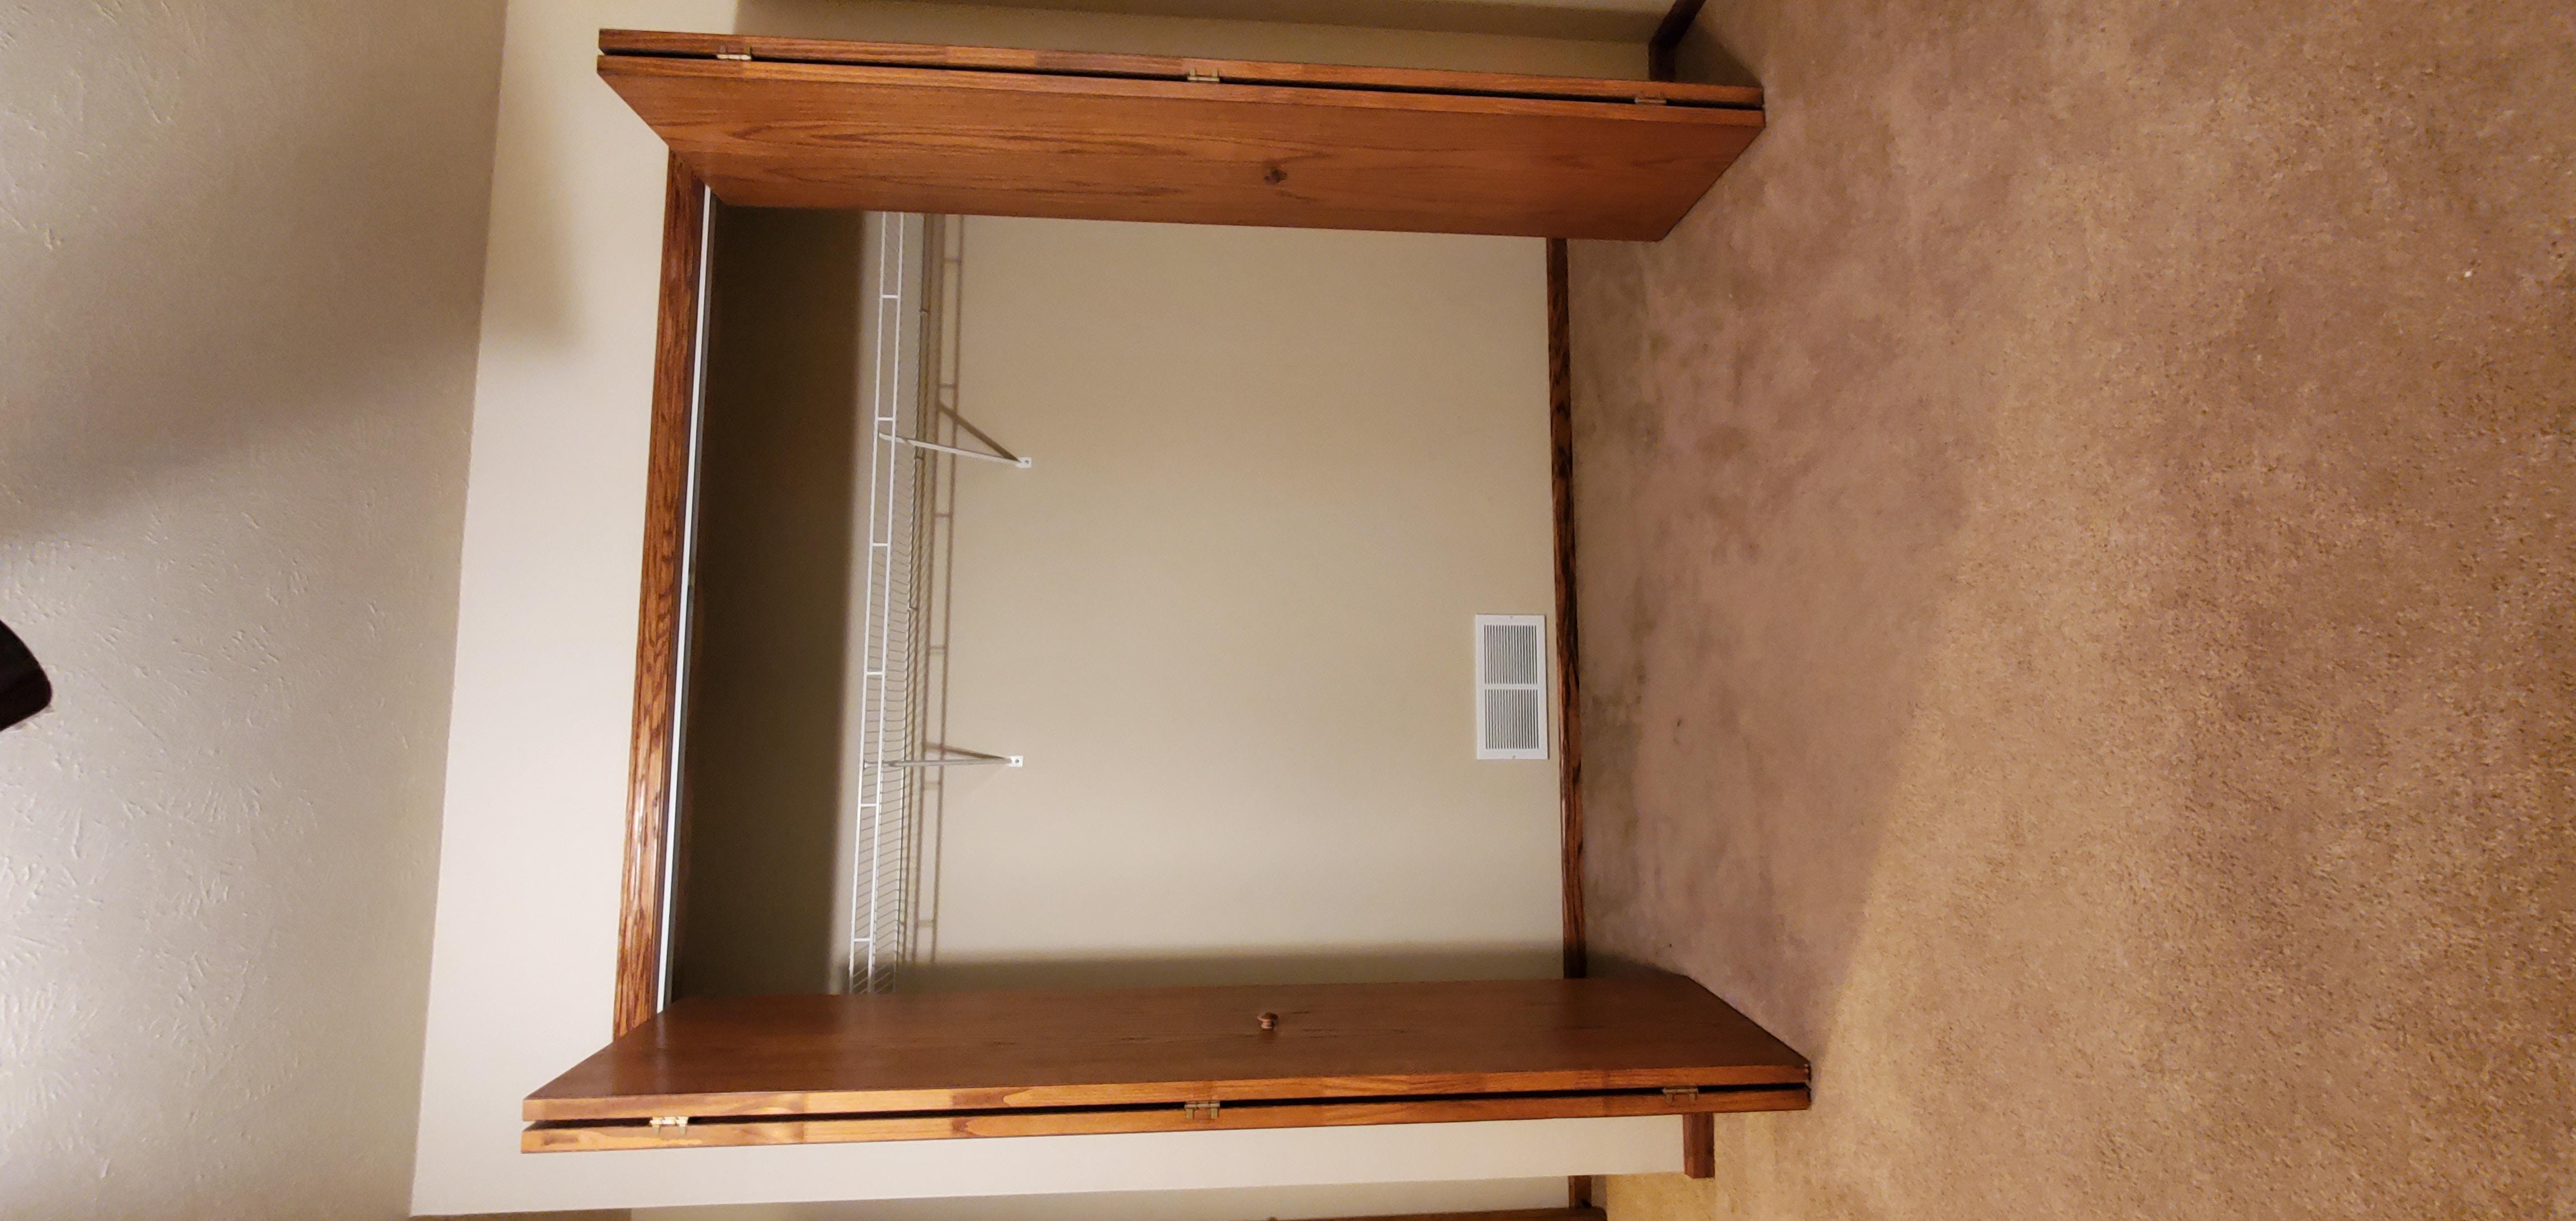 secondary bedroom closet